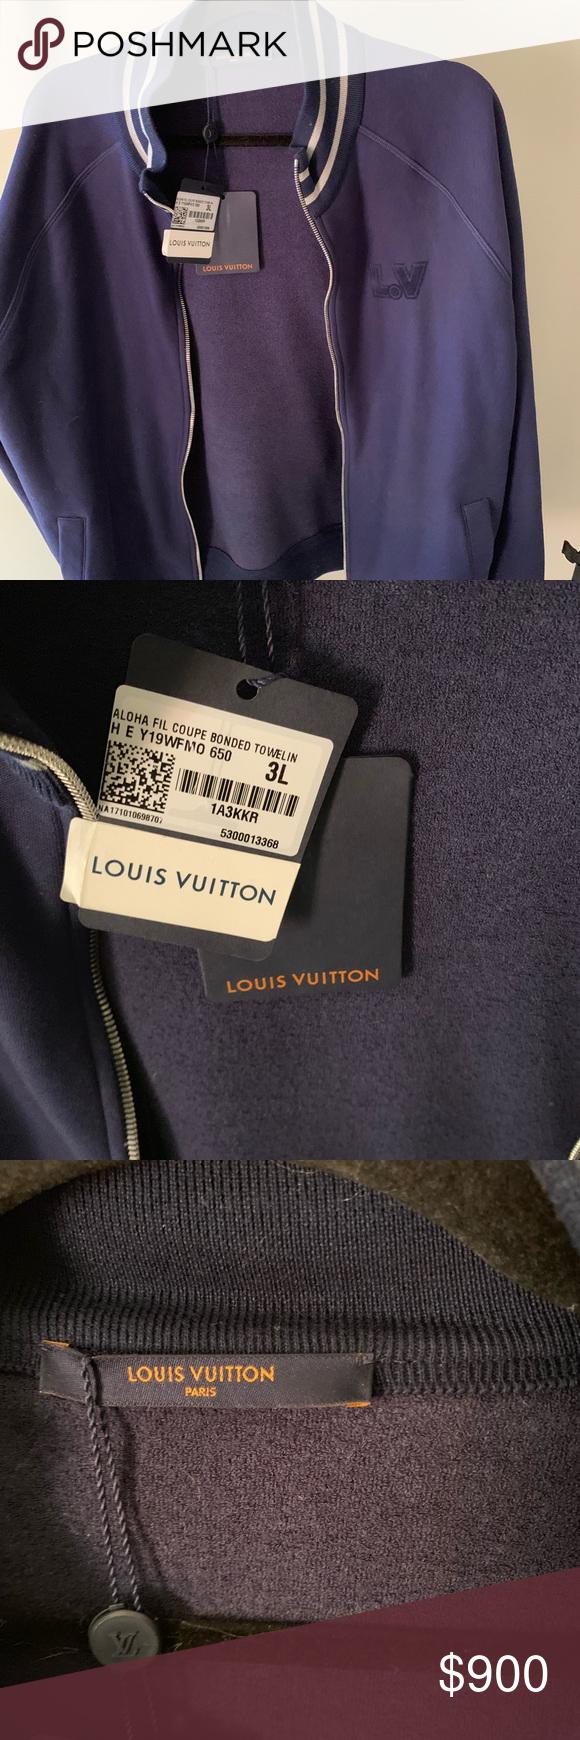 Men's Louis Vuitton varsity jacket blue NWT NWT #varsityjacketoutfit Spotted while shopping on Poshmark: Men's Louis Vuitton varsity jacket blue NWT! #poshmark #fashion #shopping #style #Louis Vuitton #Other #varsityjacketoutfit